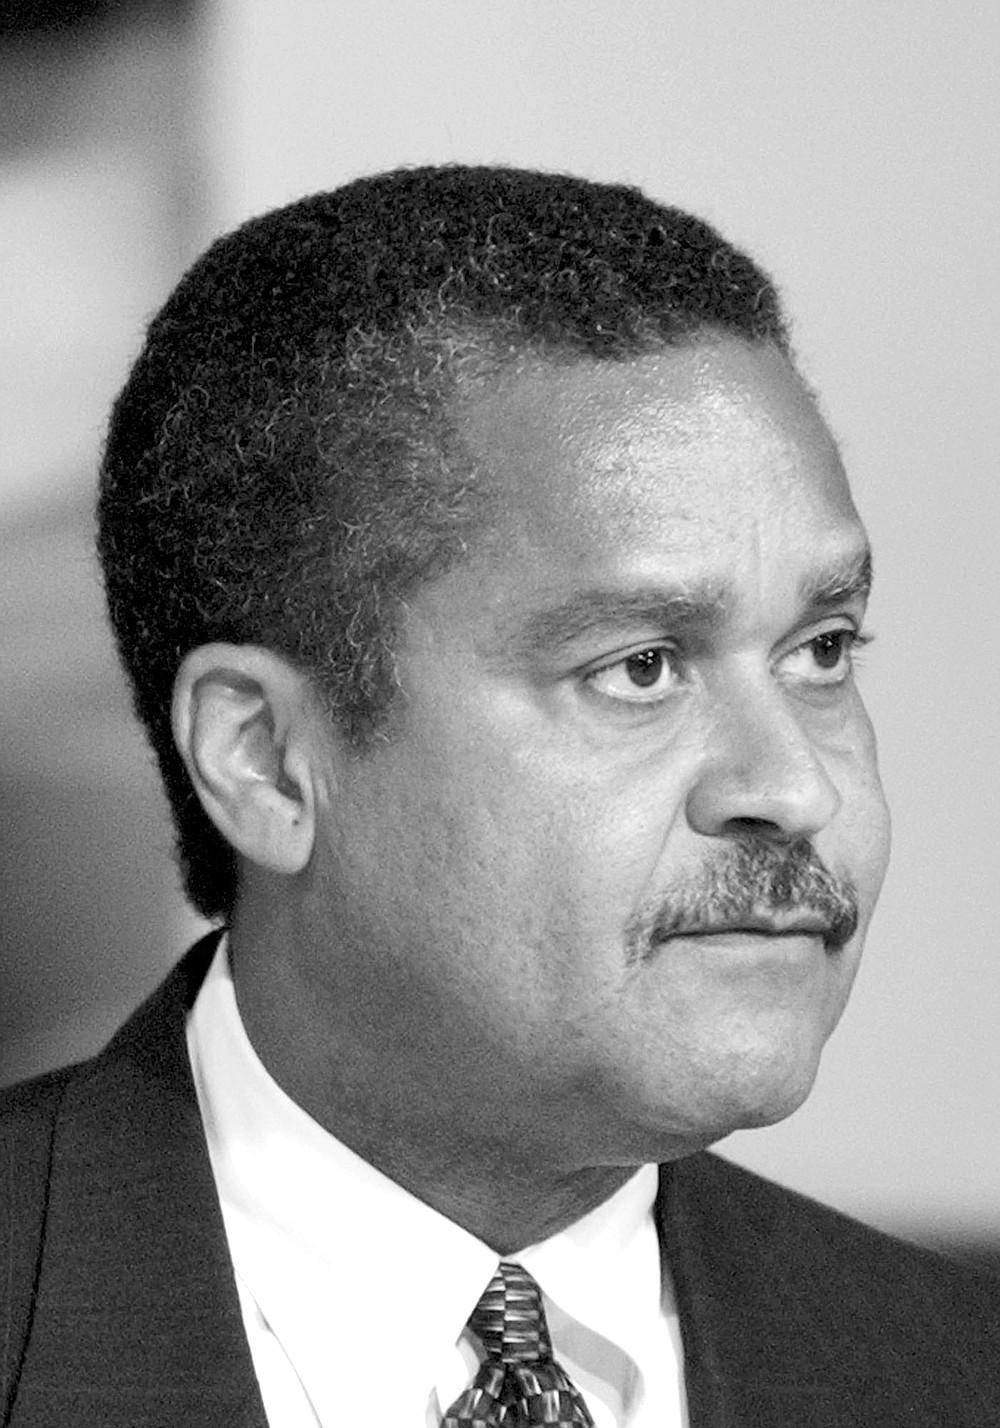 Michel Anderson, Yellow Cab /Transportation Network, registered city lobbyist